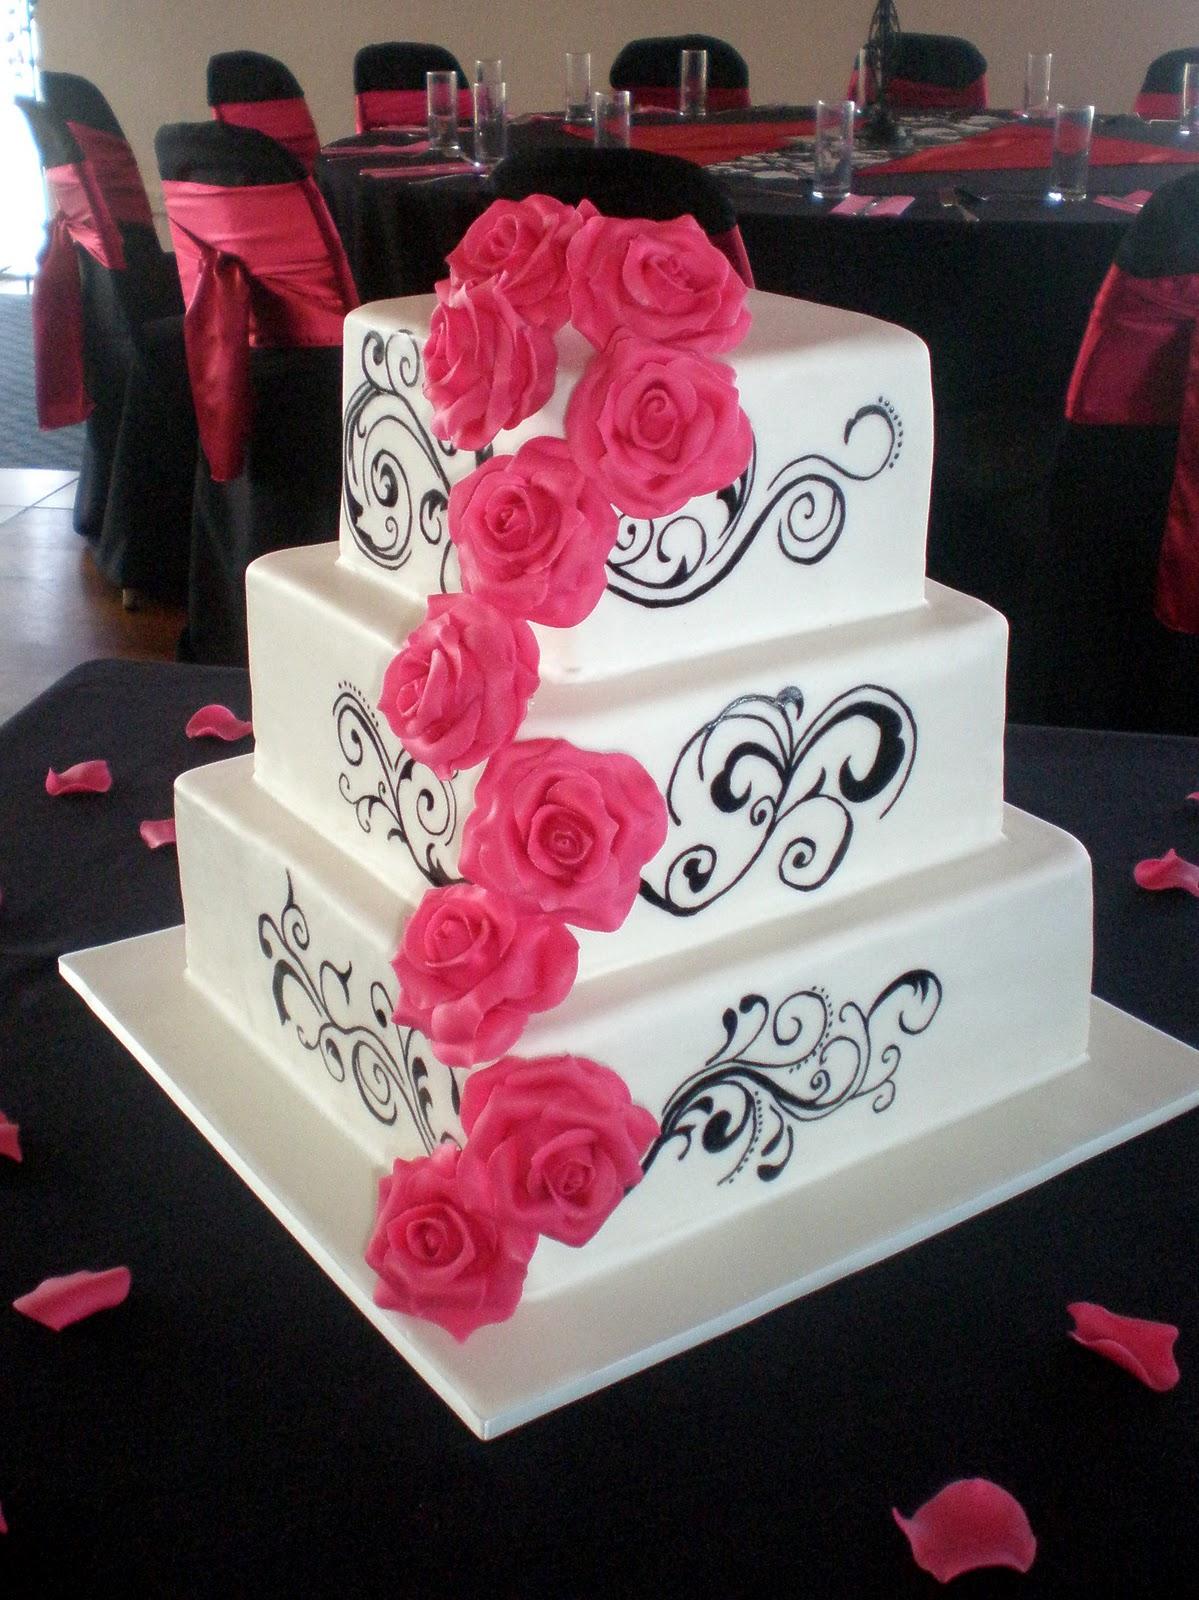 Sugar Siren Cakes Mackay Hot Pink Roses & Vines Wedding Cake